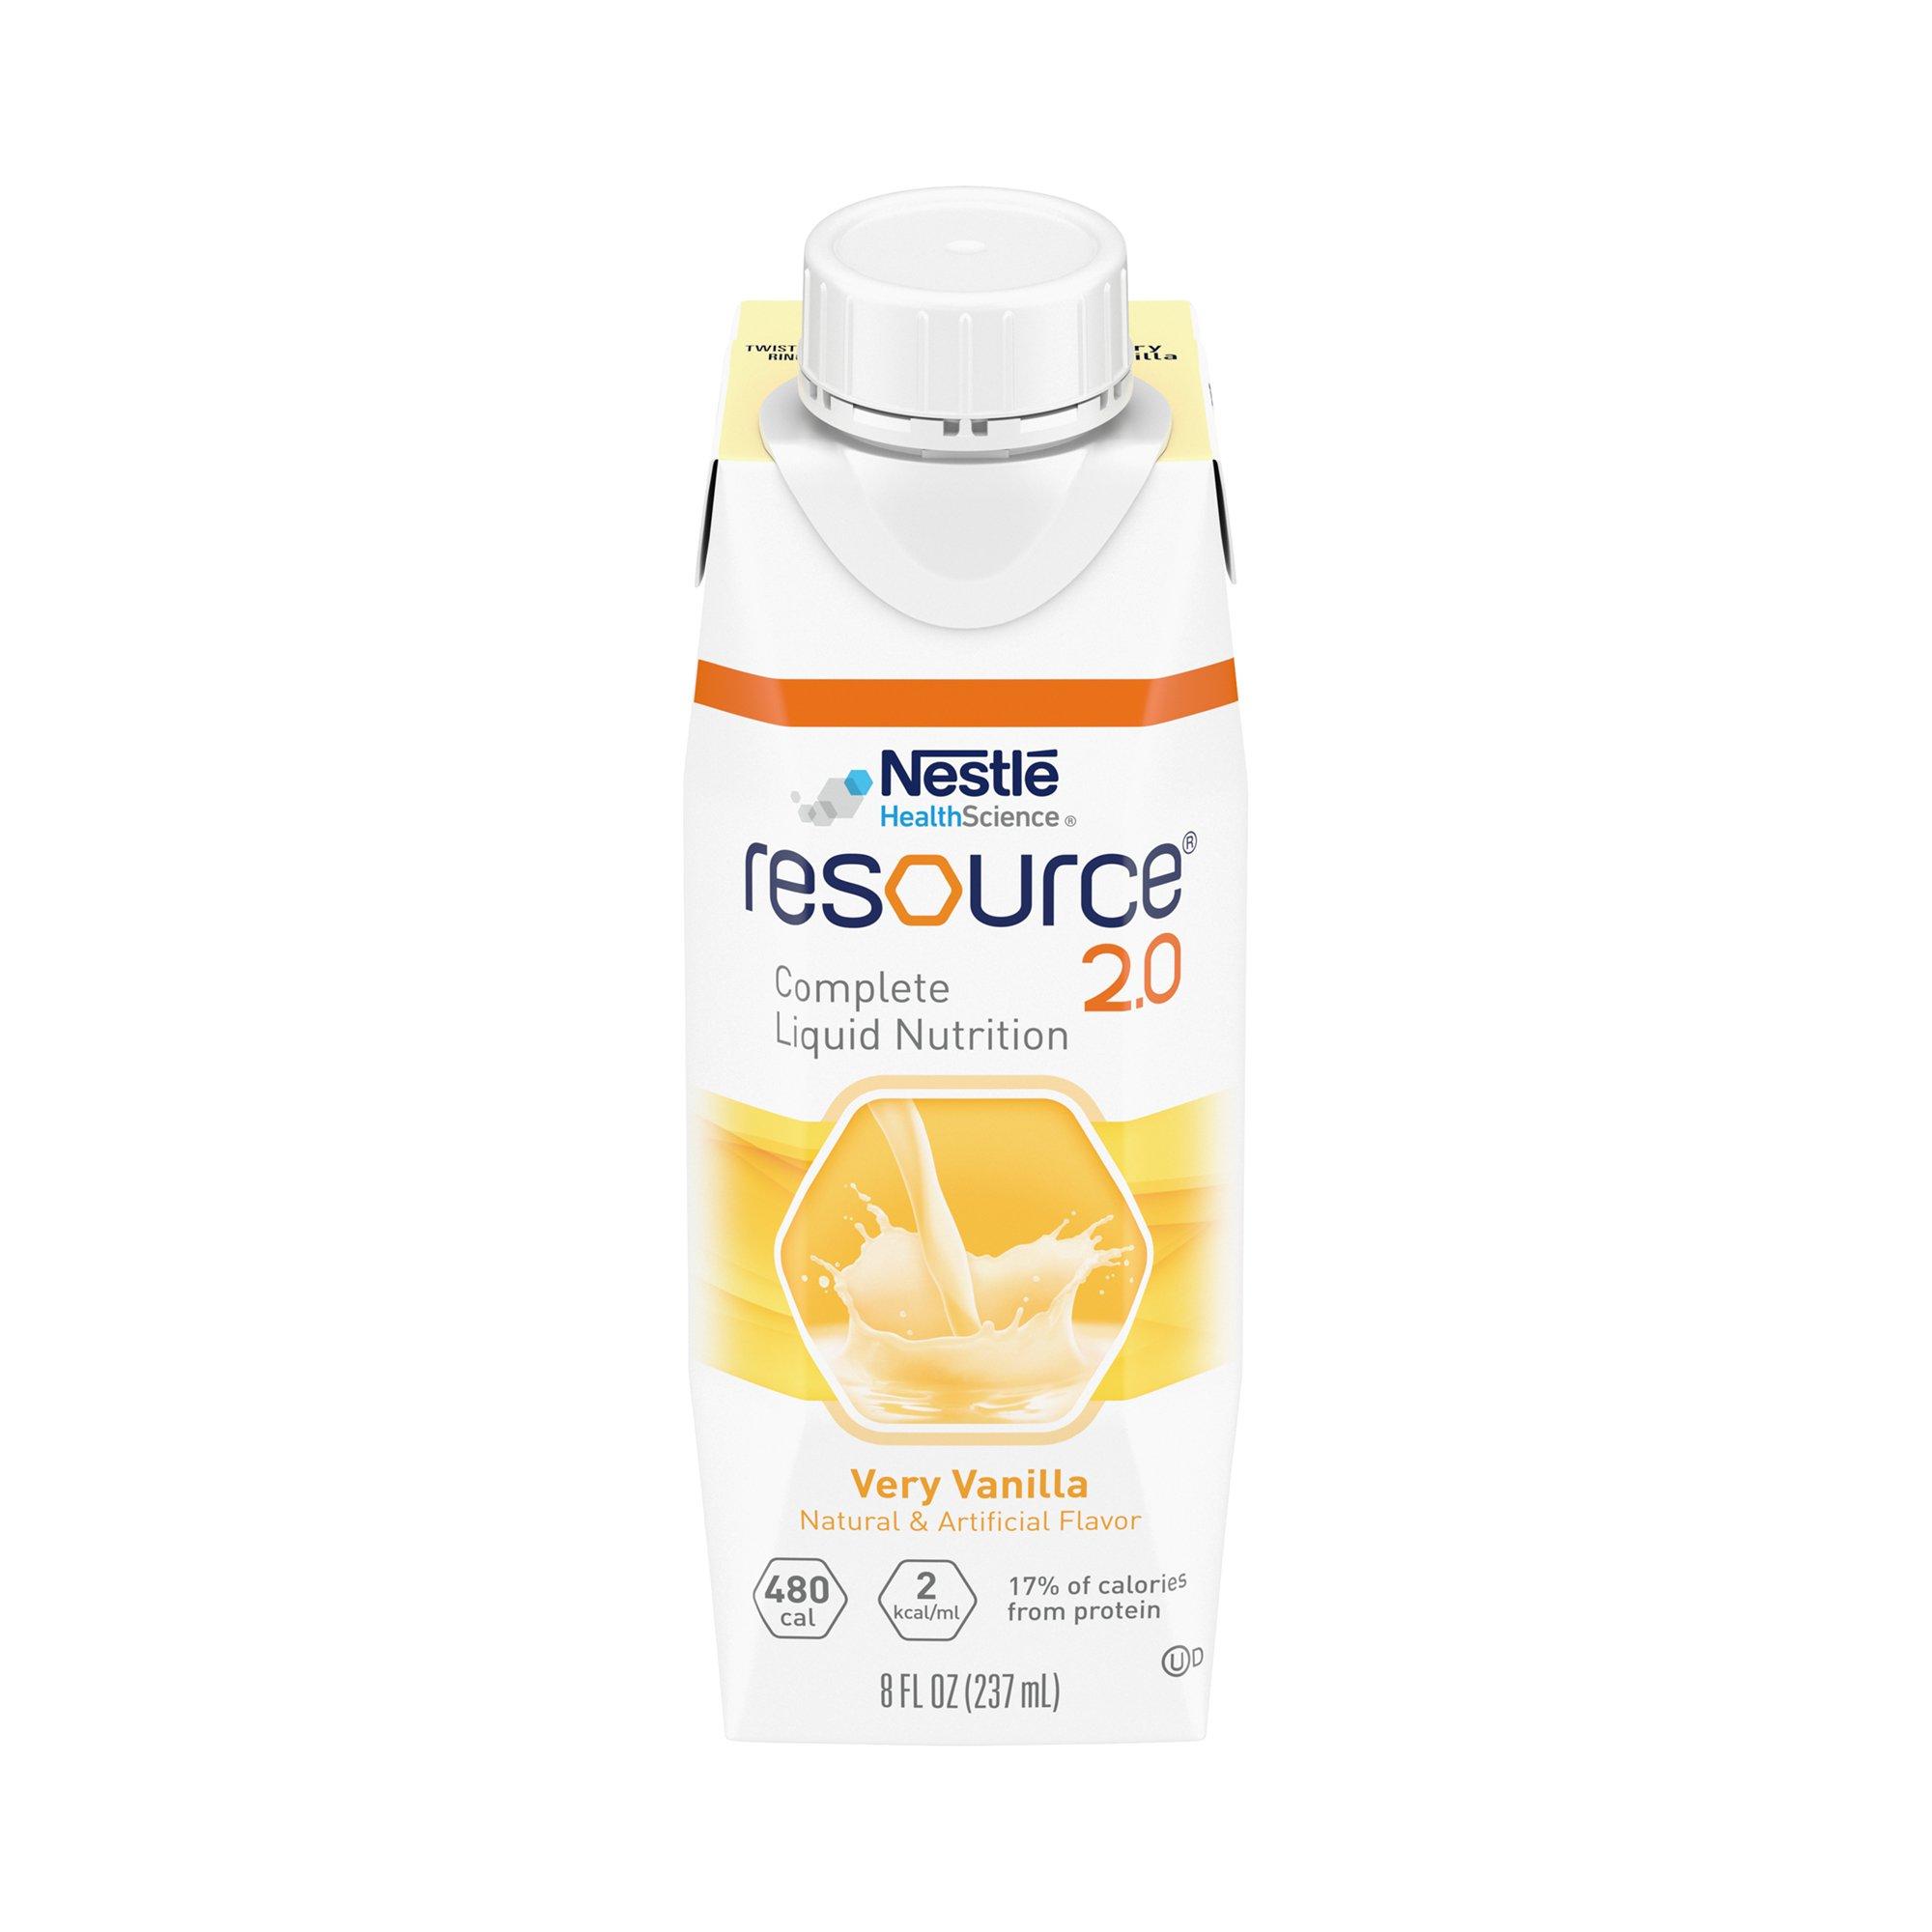 Nestle HealthScience Resource 2.0 Complete Liquid Nutrition, Very Vanilla, 00043900151670, Case of 24